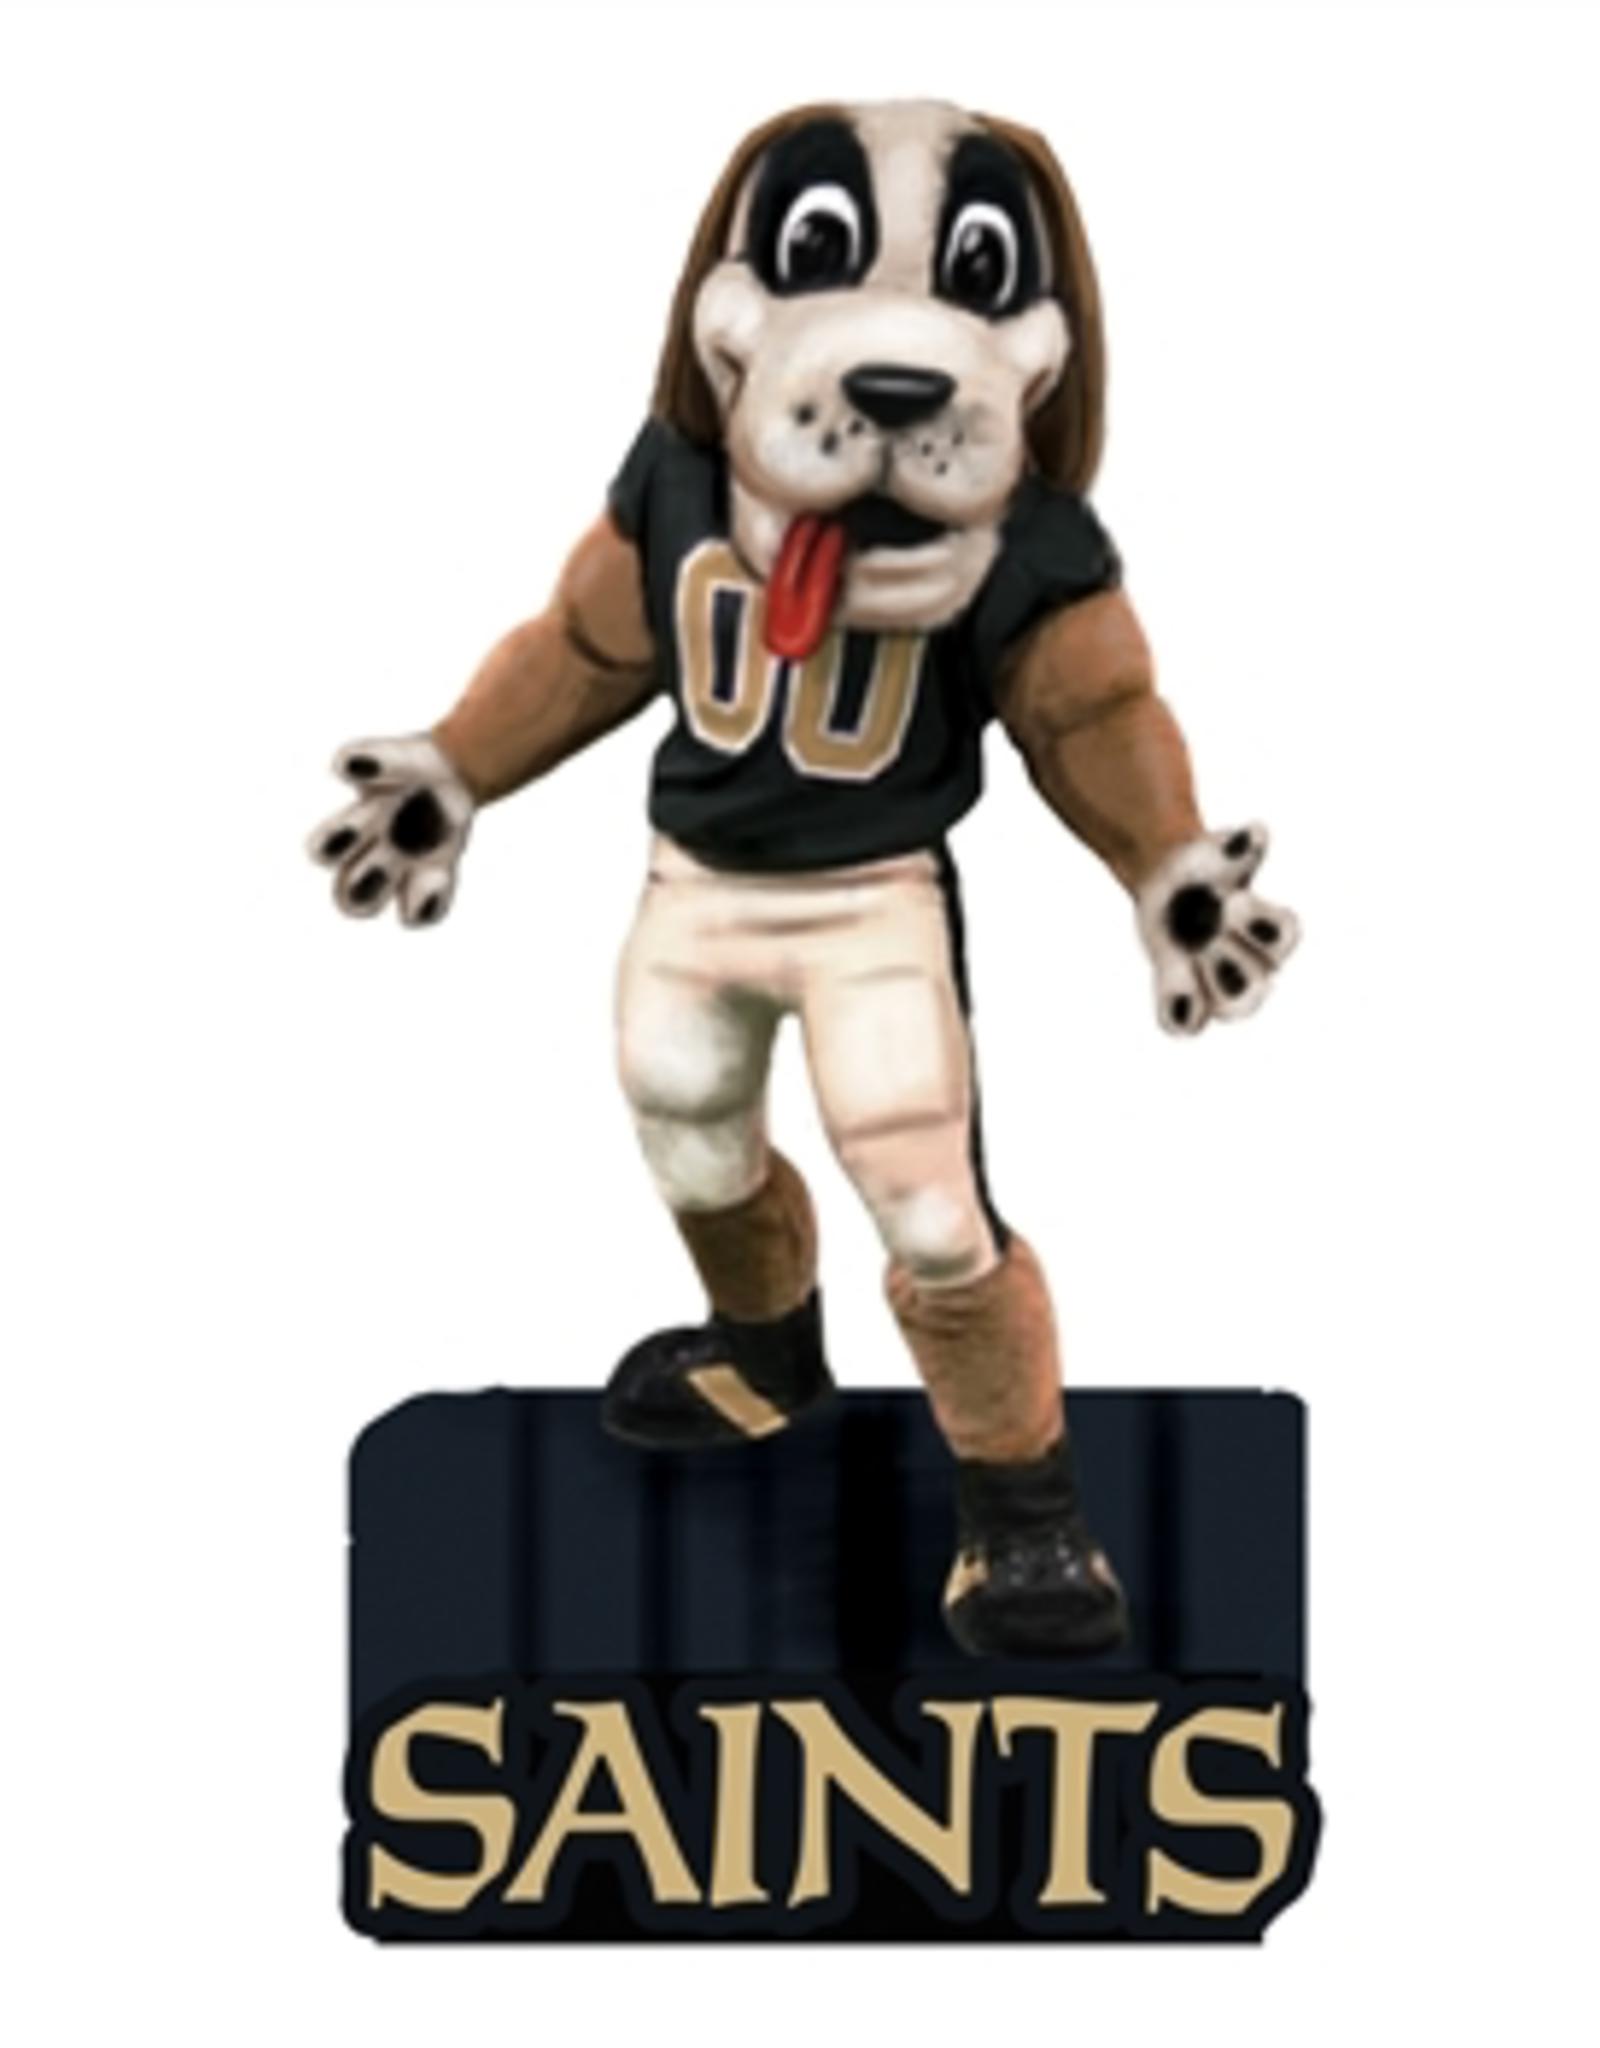 EVERGREEN New Orleans Saints Mascot Statue